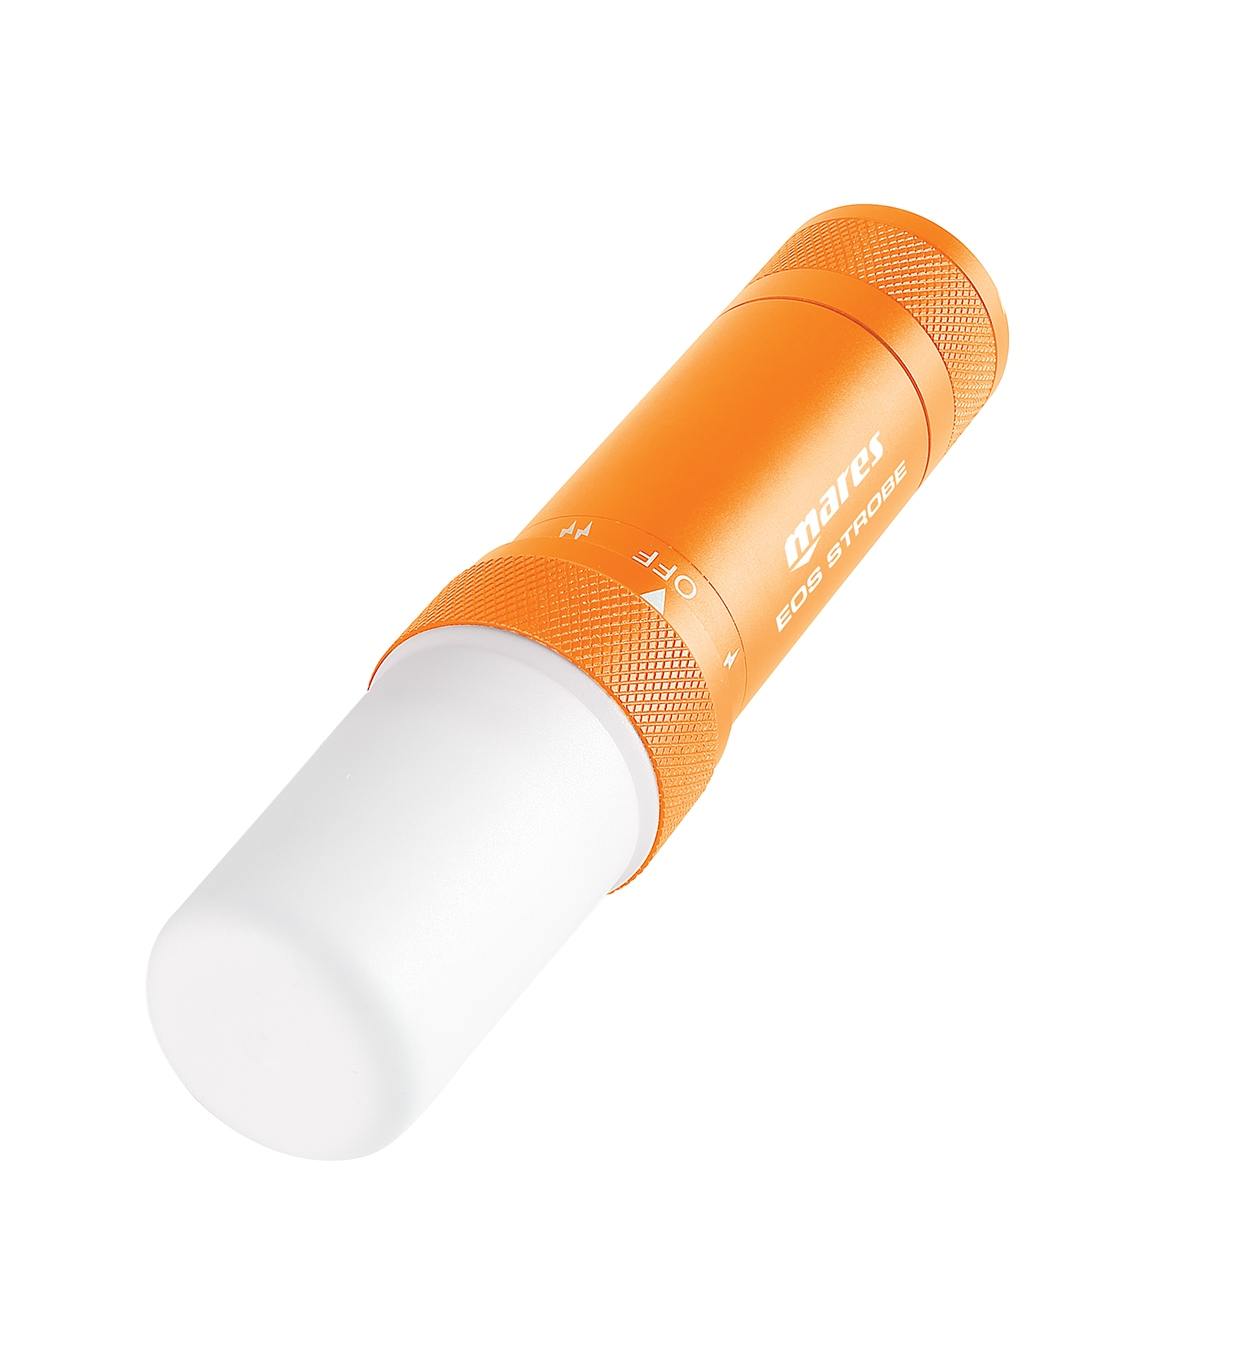 MARES - EOS Strobe Tauchlampe Blitzer